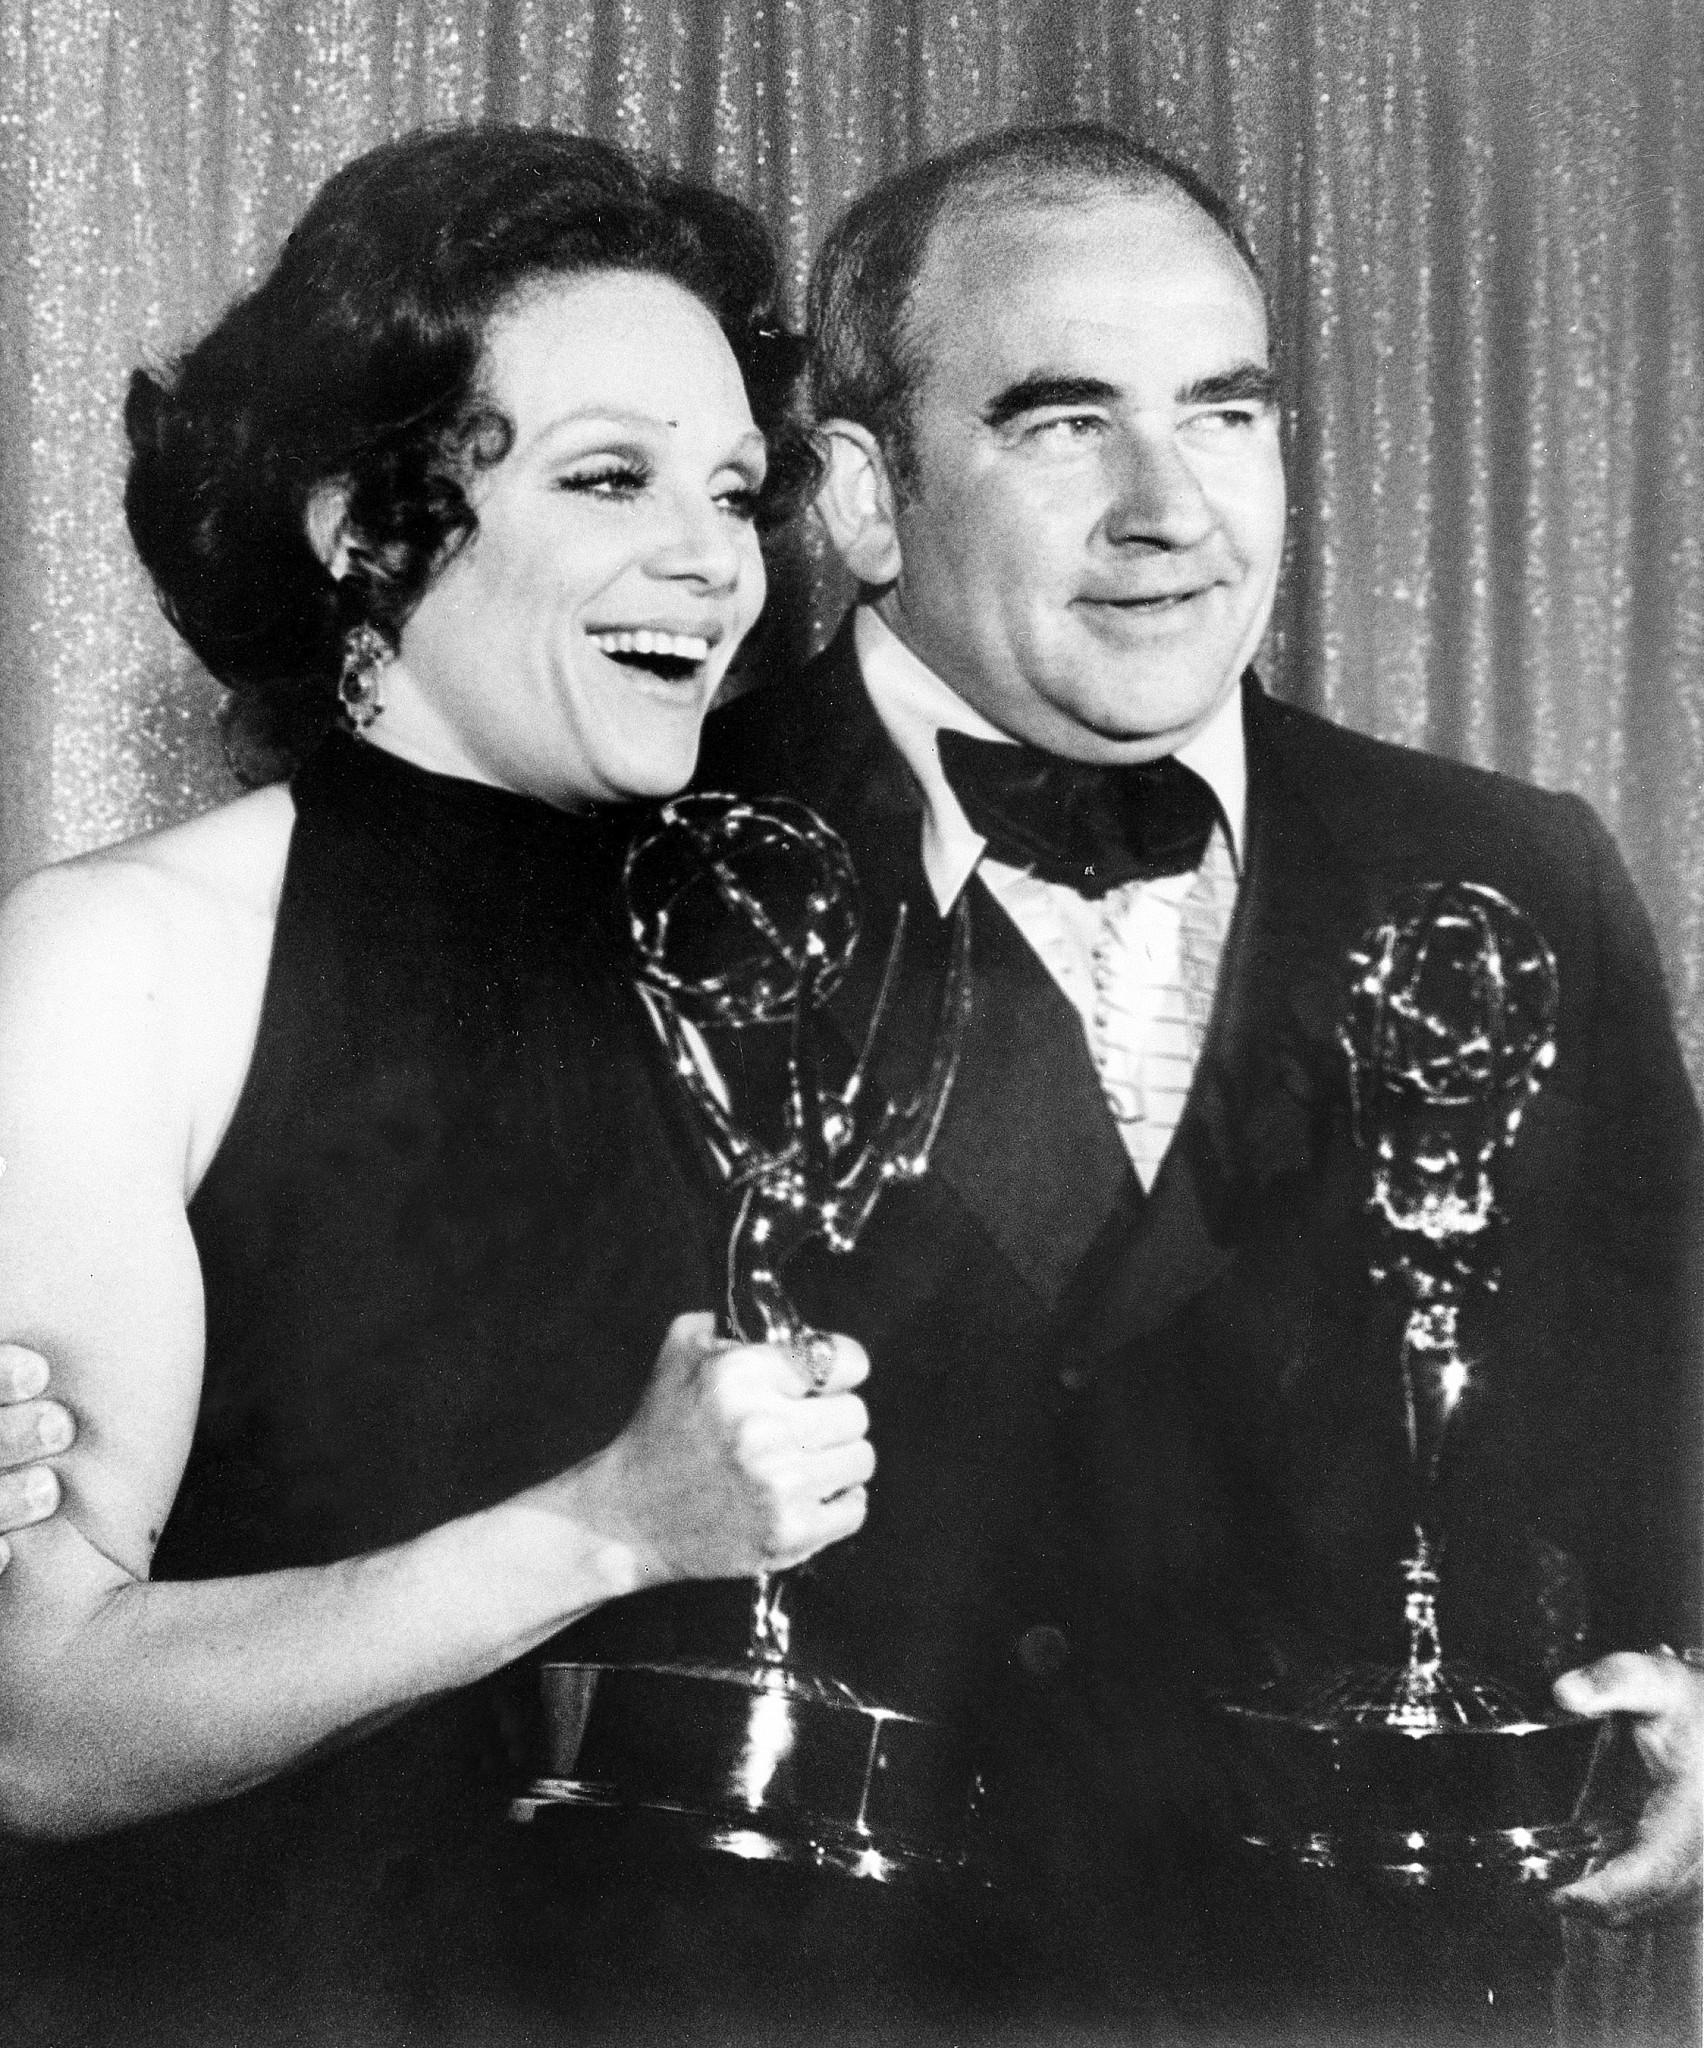 Valerie Harper, who played lovable, sassy 'Jewish' sitcom